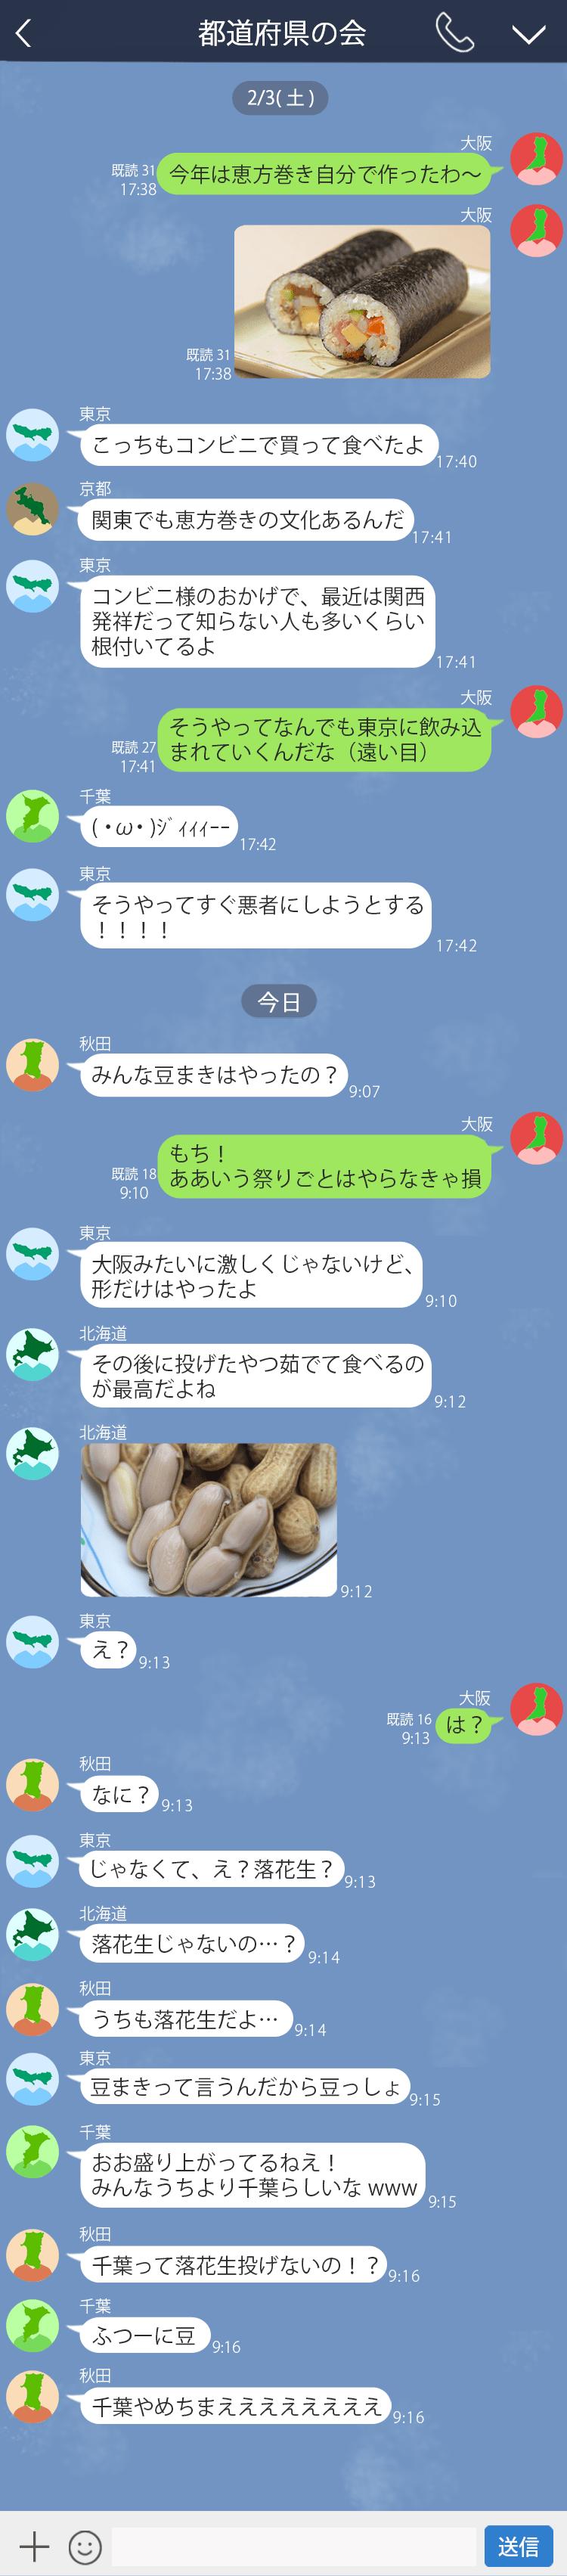 todohuken_LINE_6